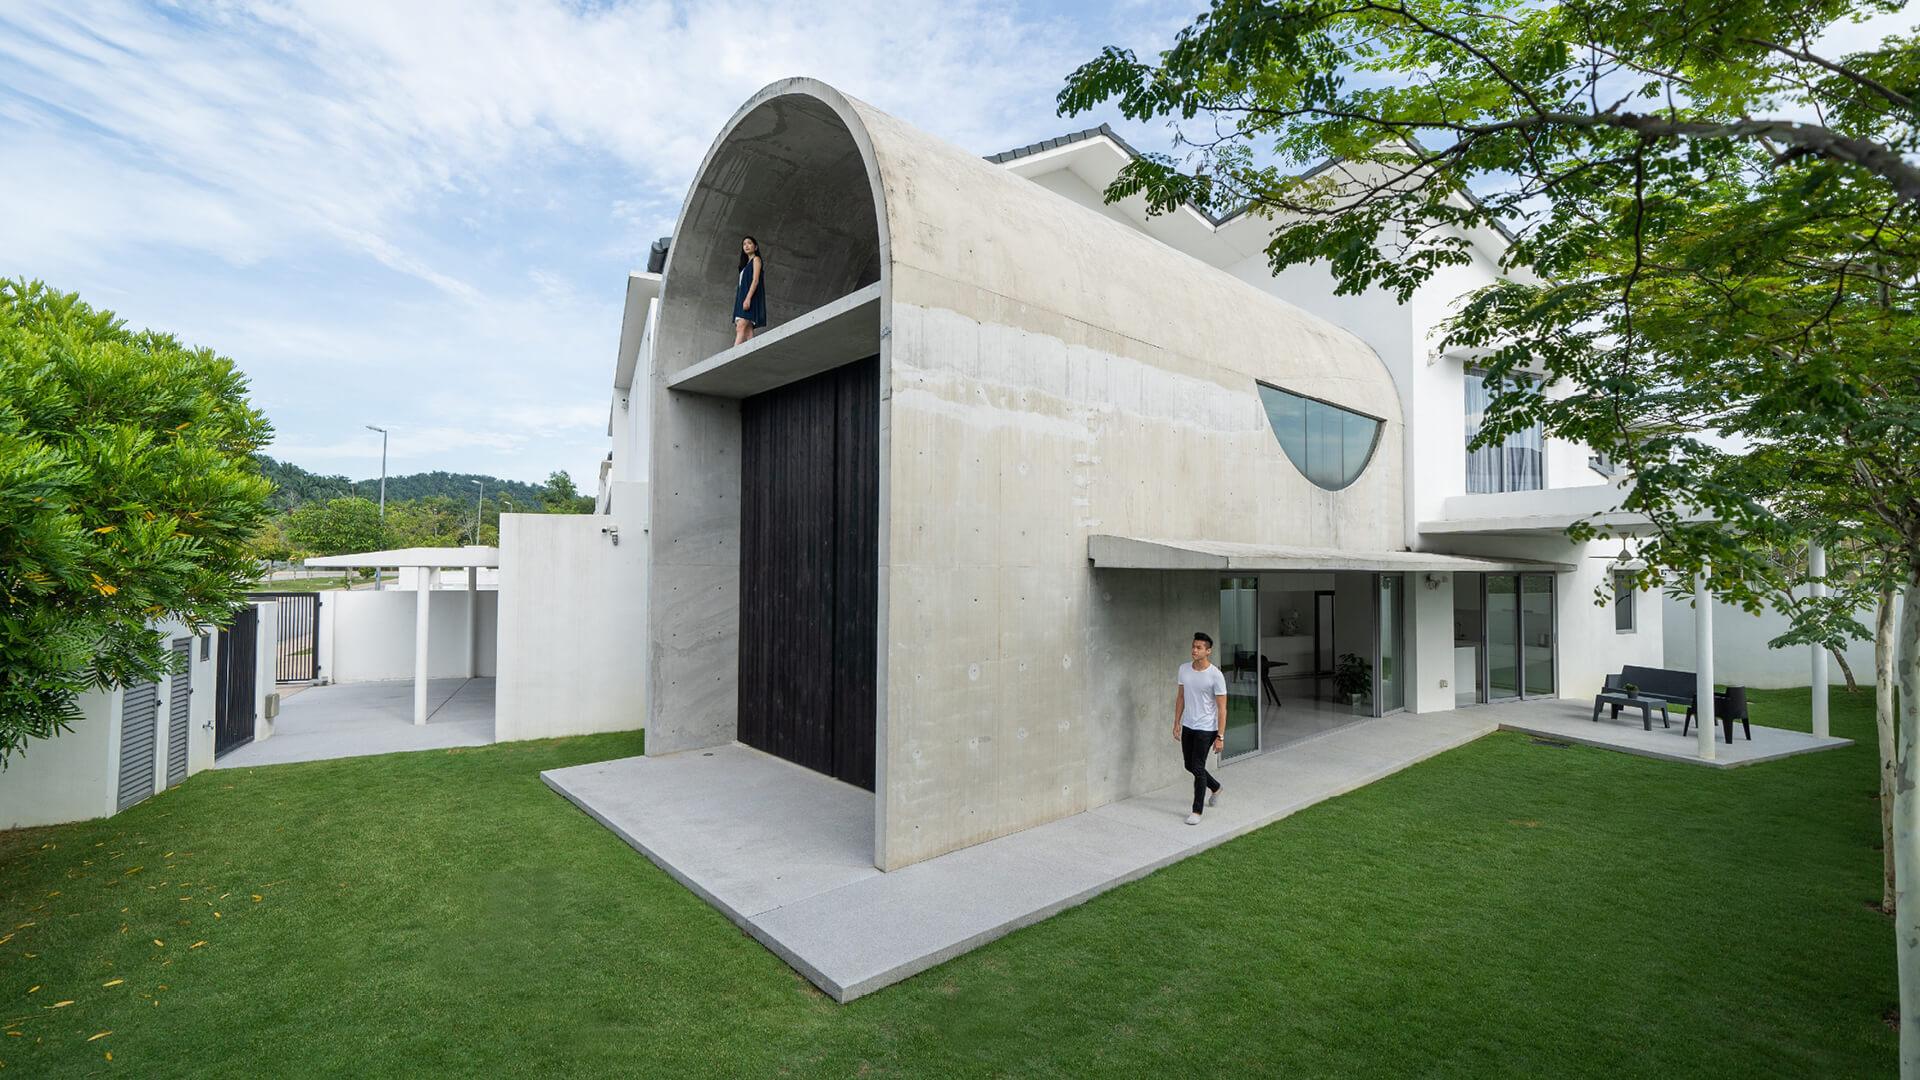 Bewboc House by Fabian Tan Architect Kuala Lampur, Malaysia | Fabian Tan | STIRworld